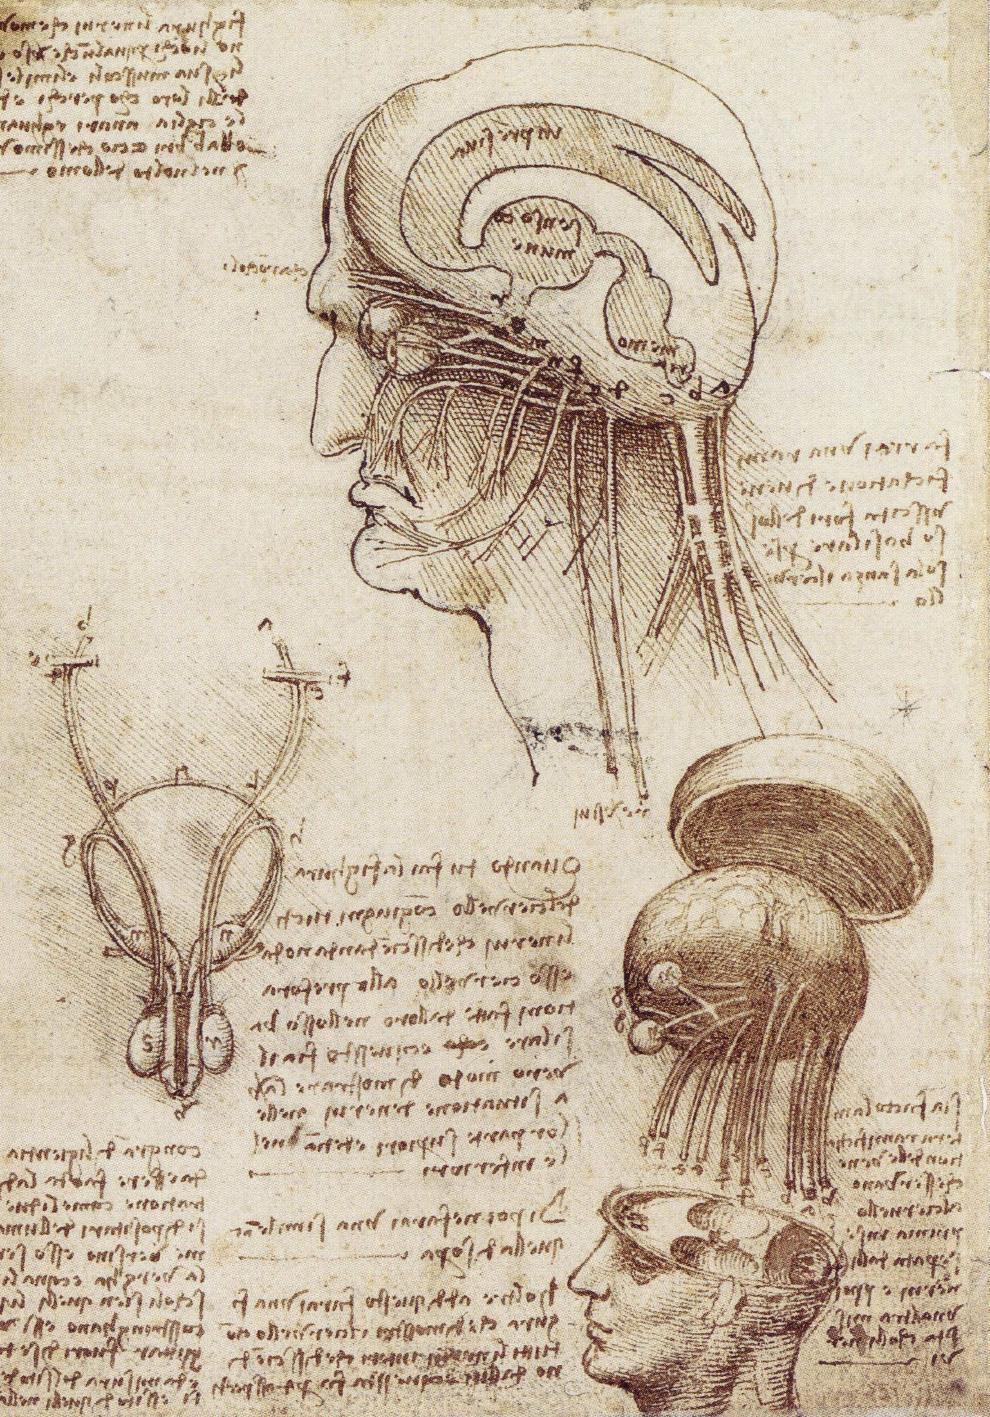 Study of Brain Physiology, c. 1508